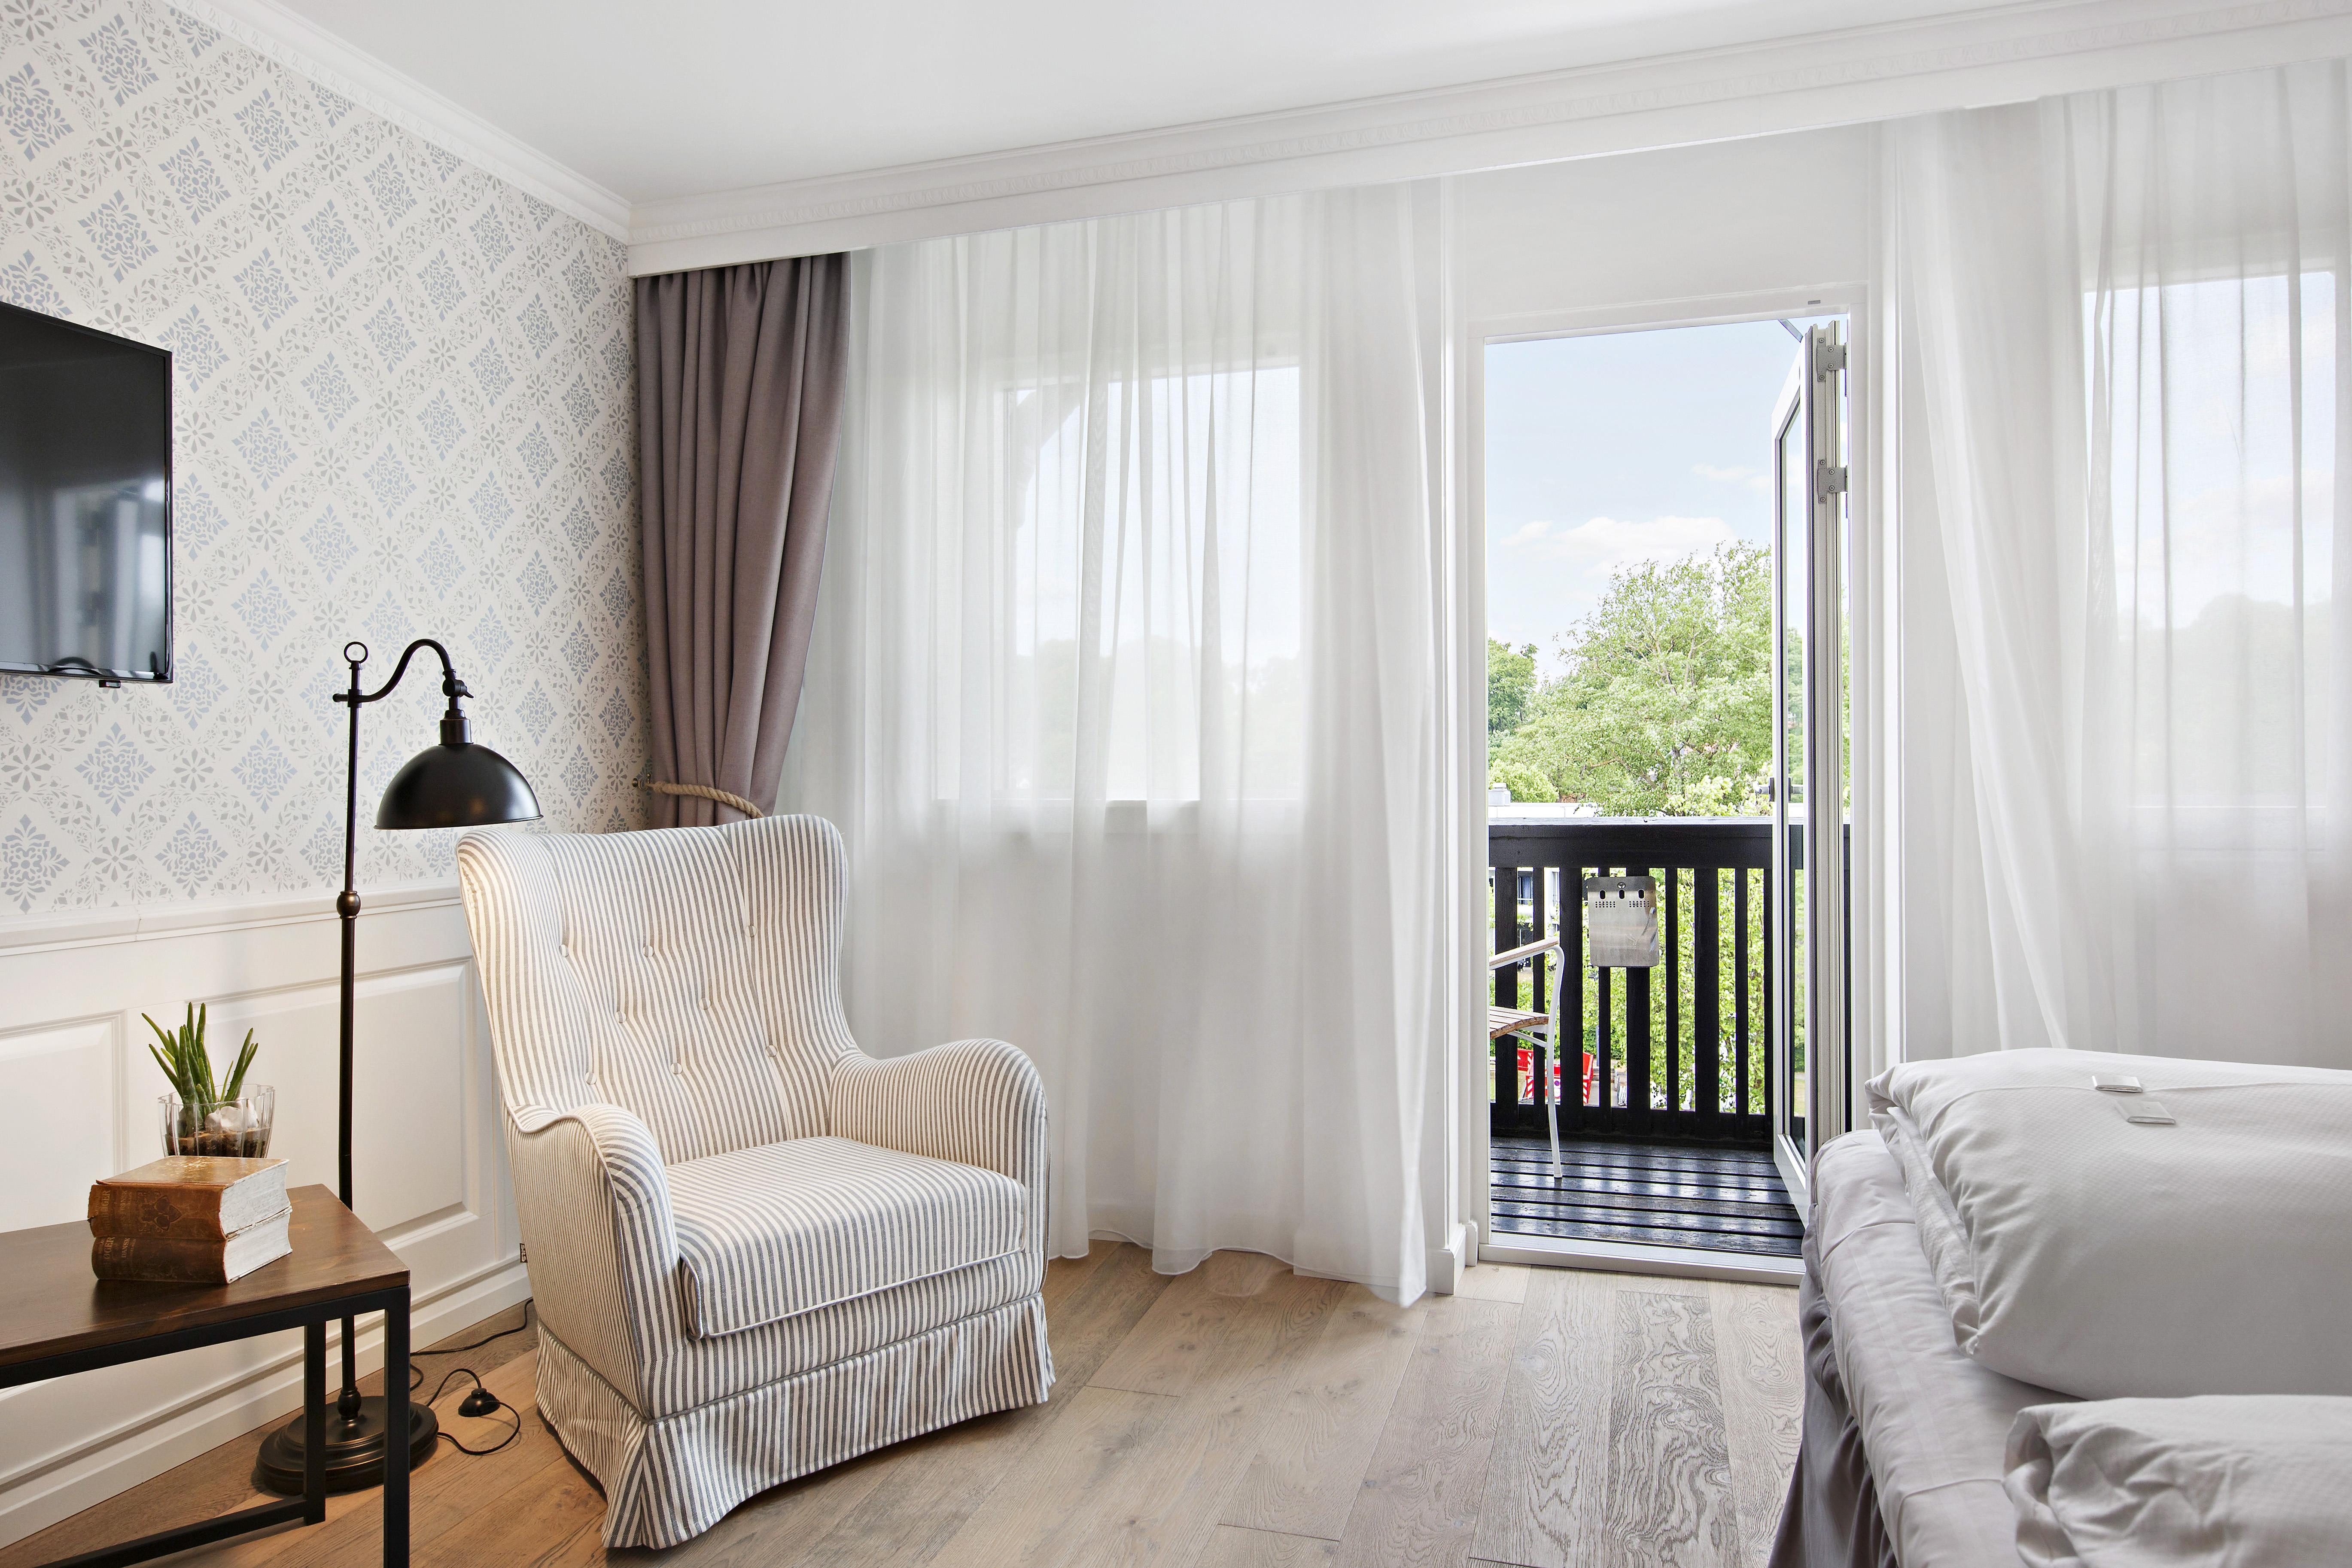 Marienlyst Strandhotel - internationalt hotel i Helsingør